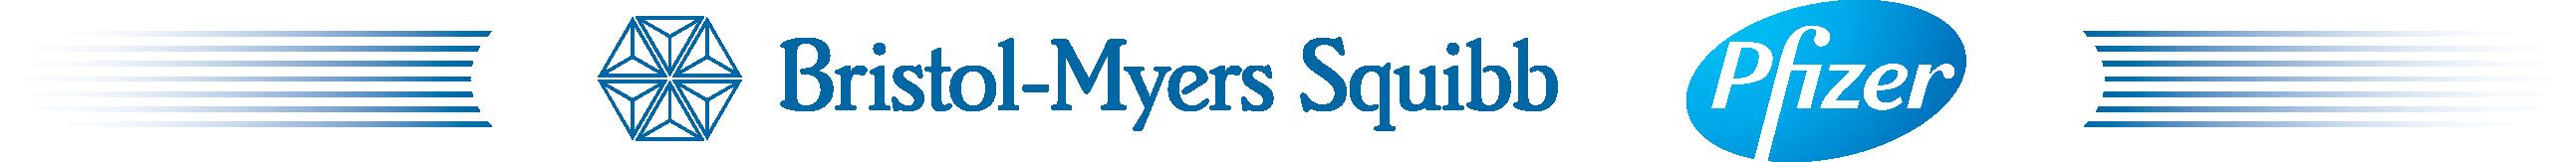 Bristol-Myers Squibb Pfizer logo